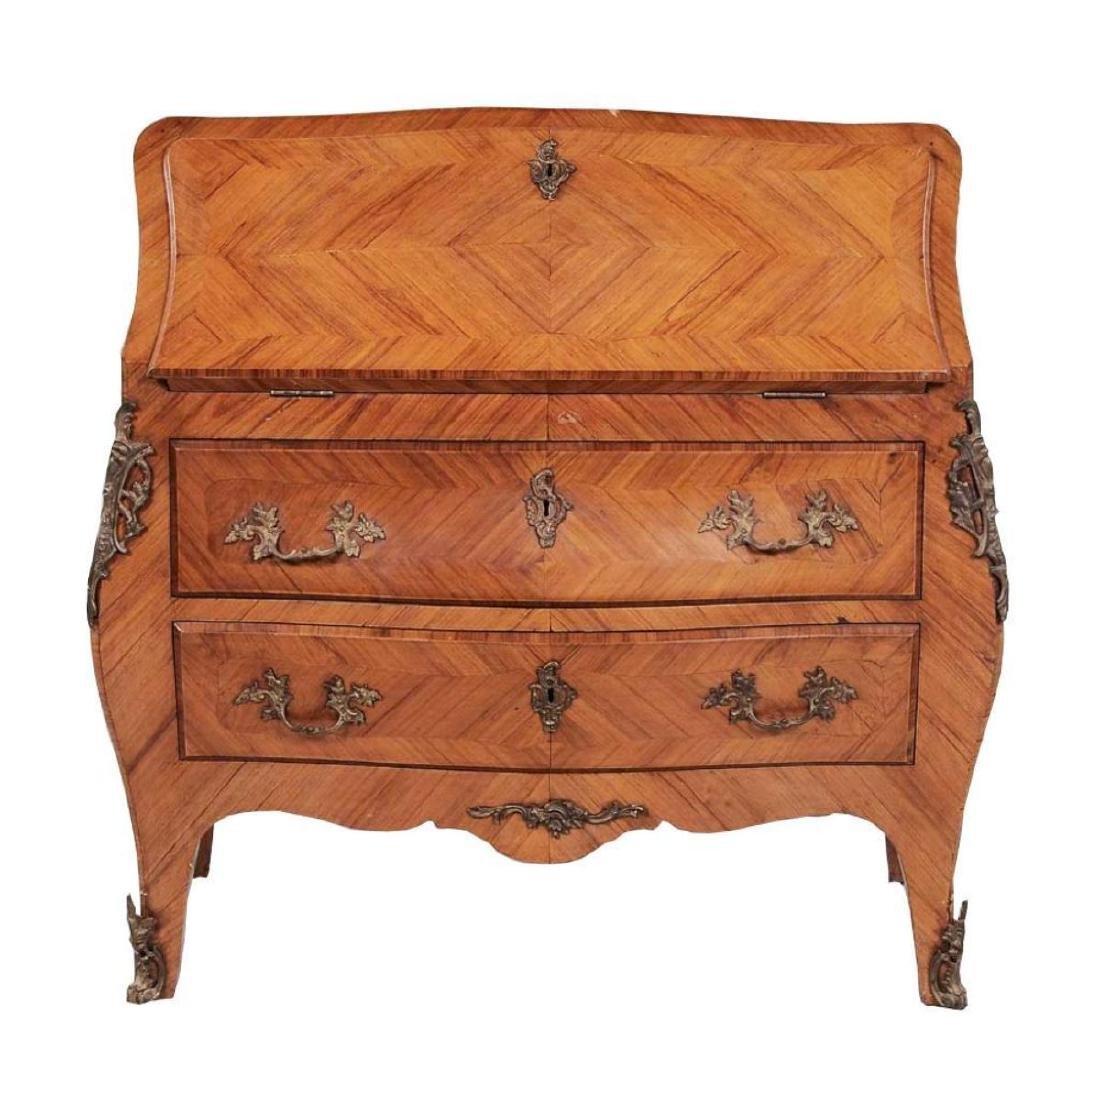 Louis XV-Style Parquetry Desk